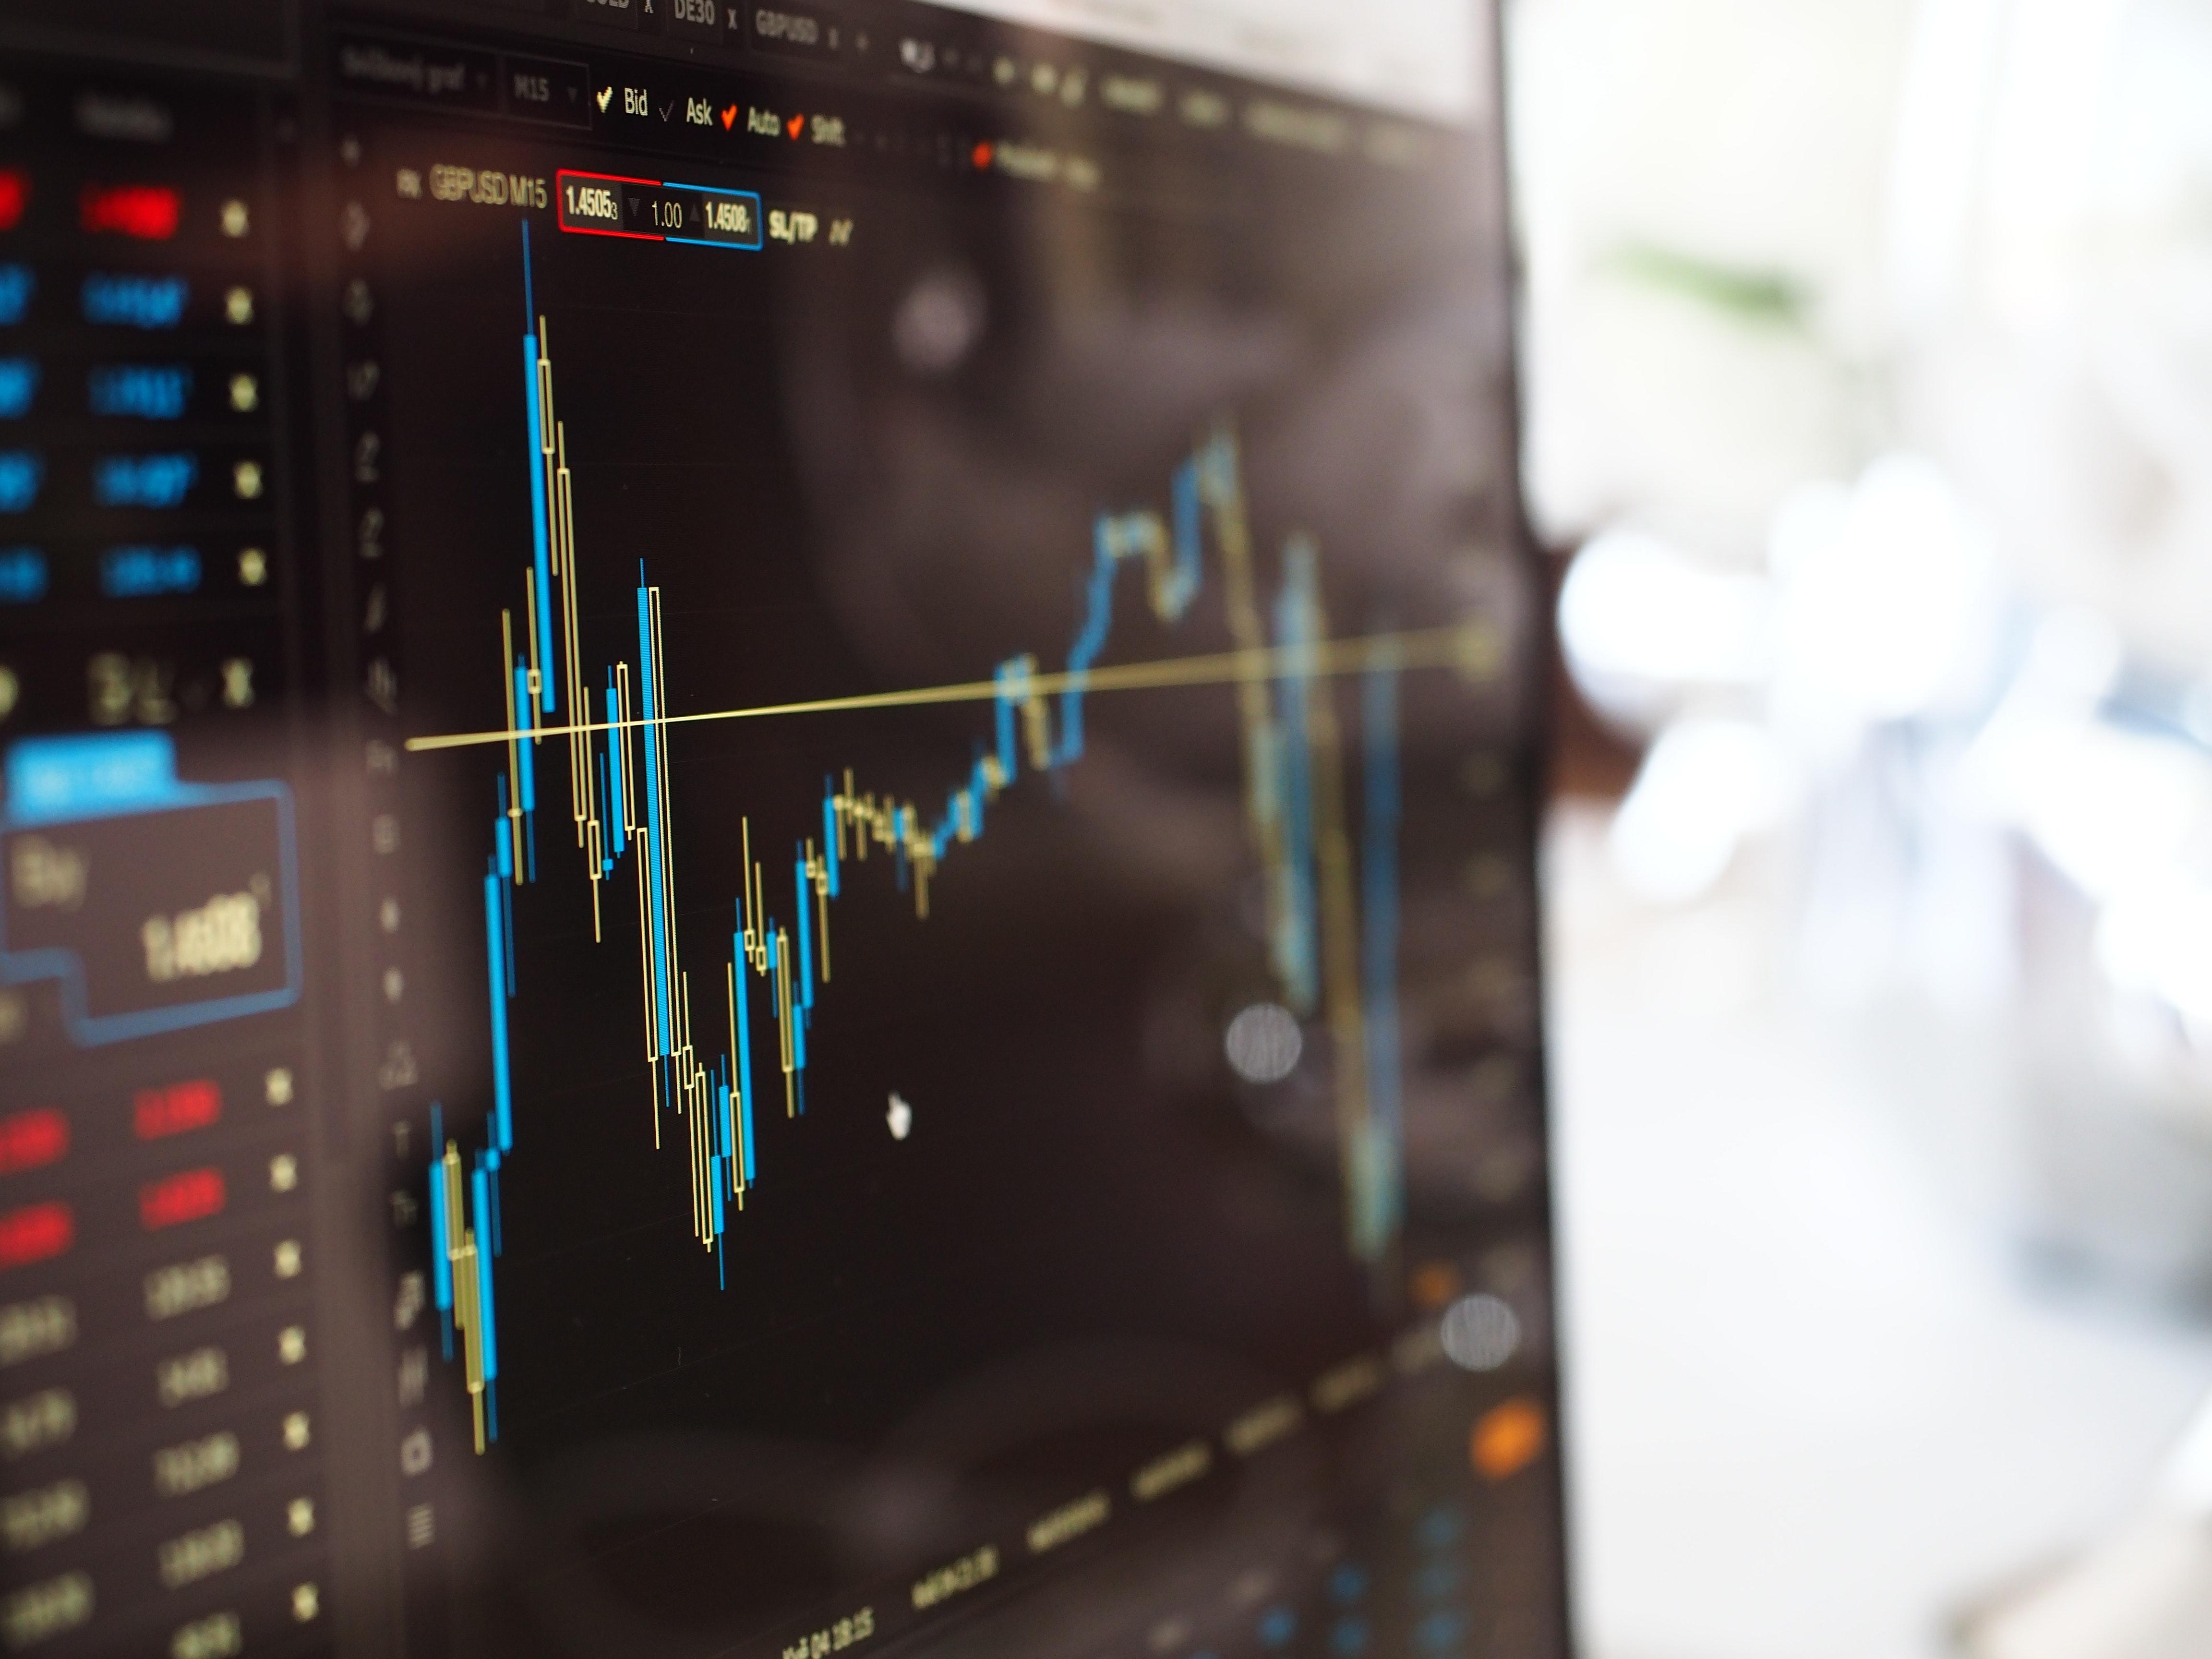 graphique de trading